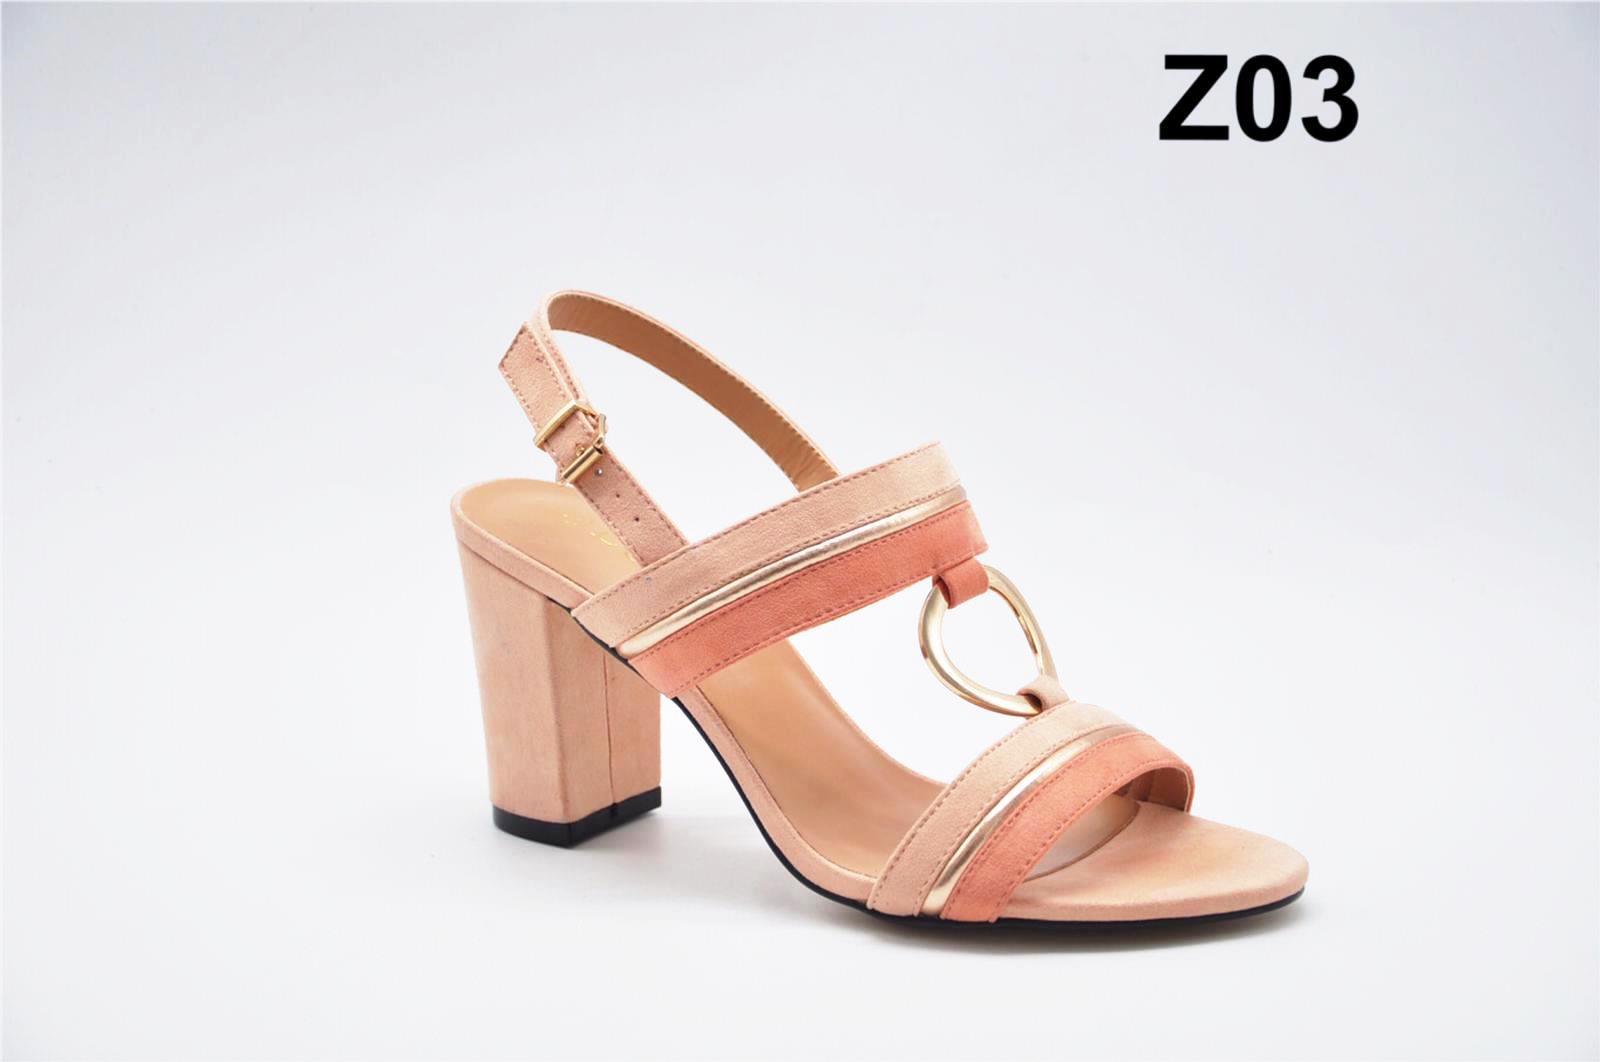 Sandale dama roz Katy